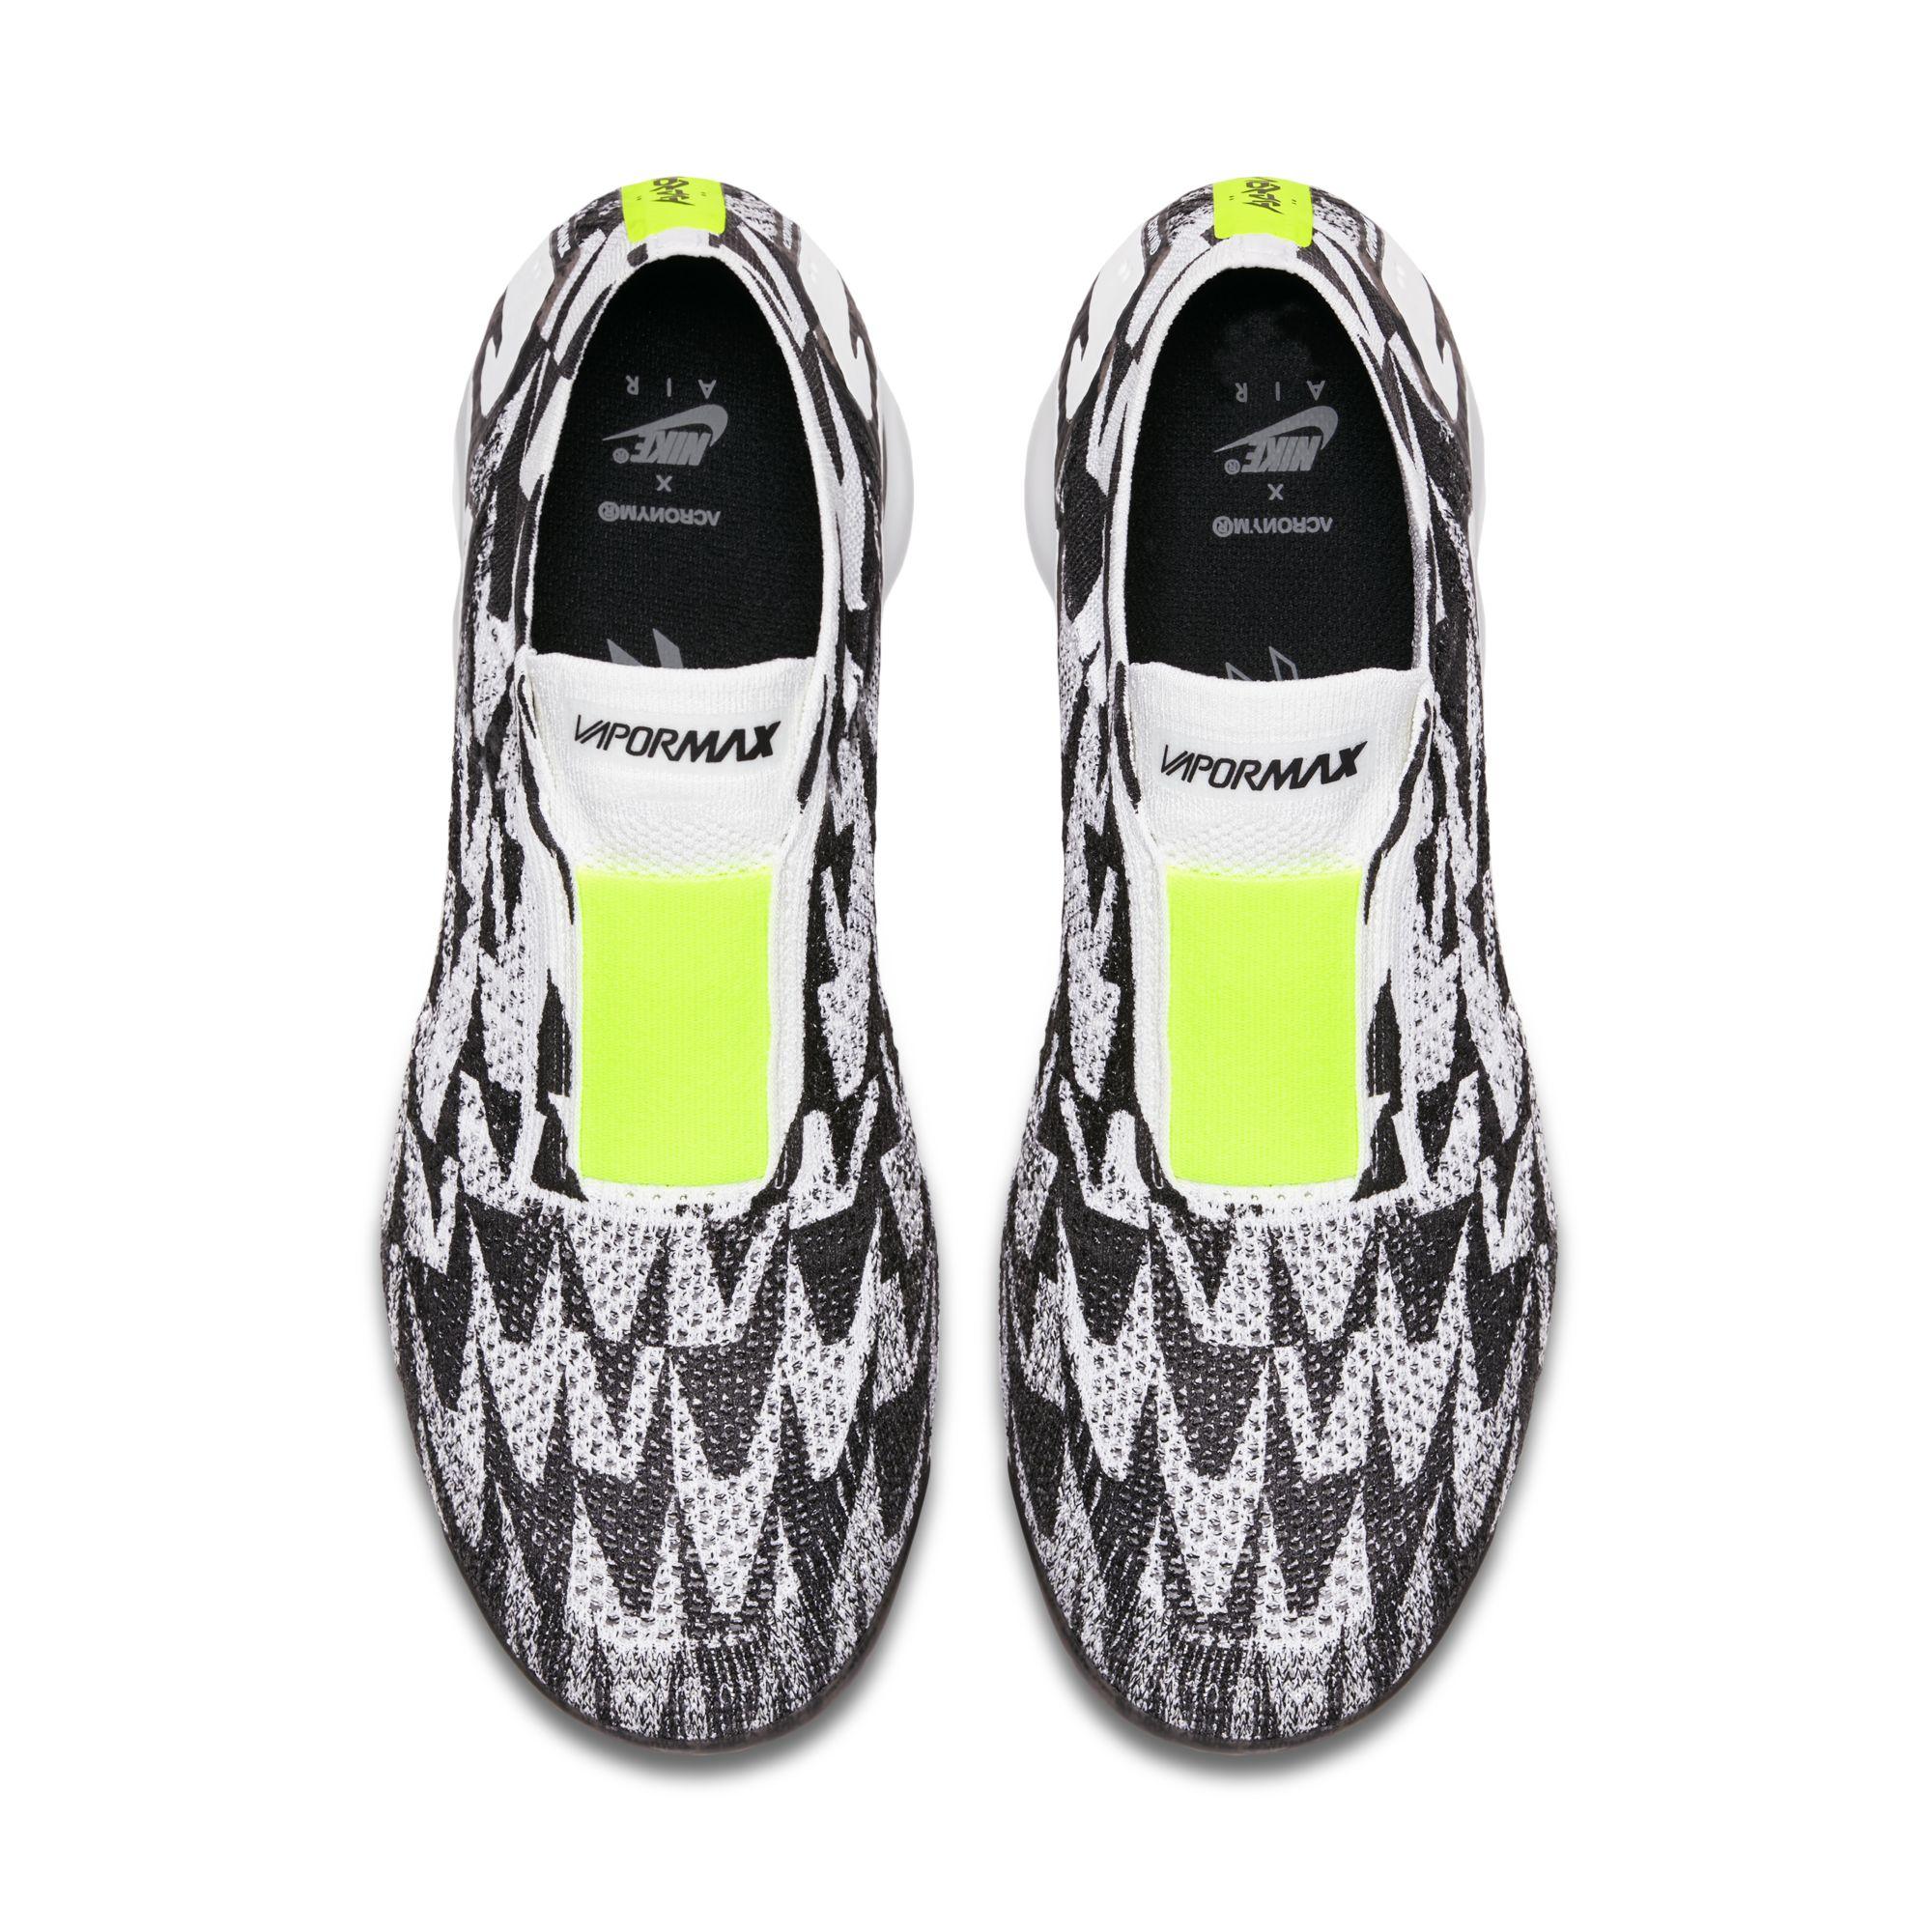 quality design 95749 01542 ACRONYM Nike air Vapormax Moc 2 2